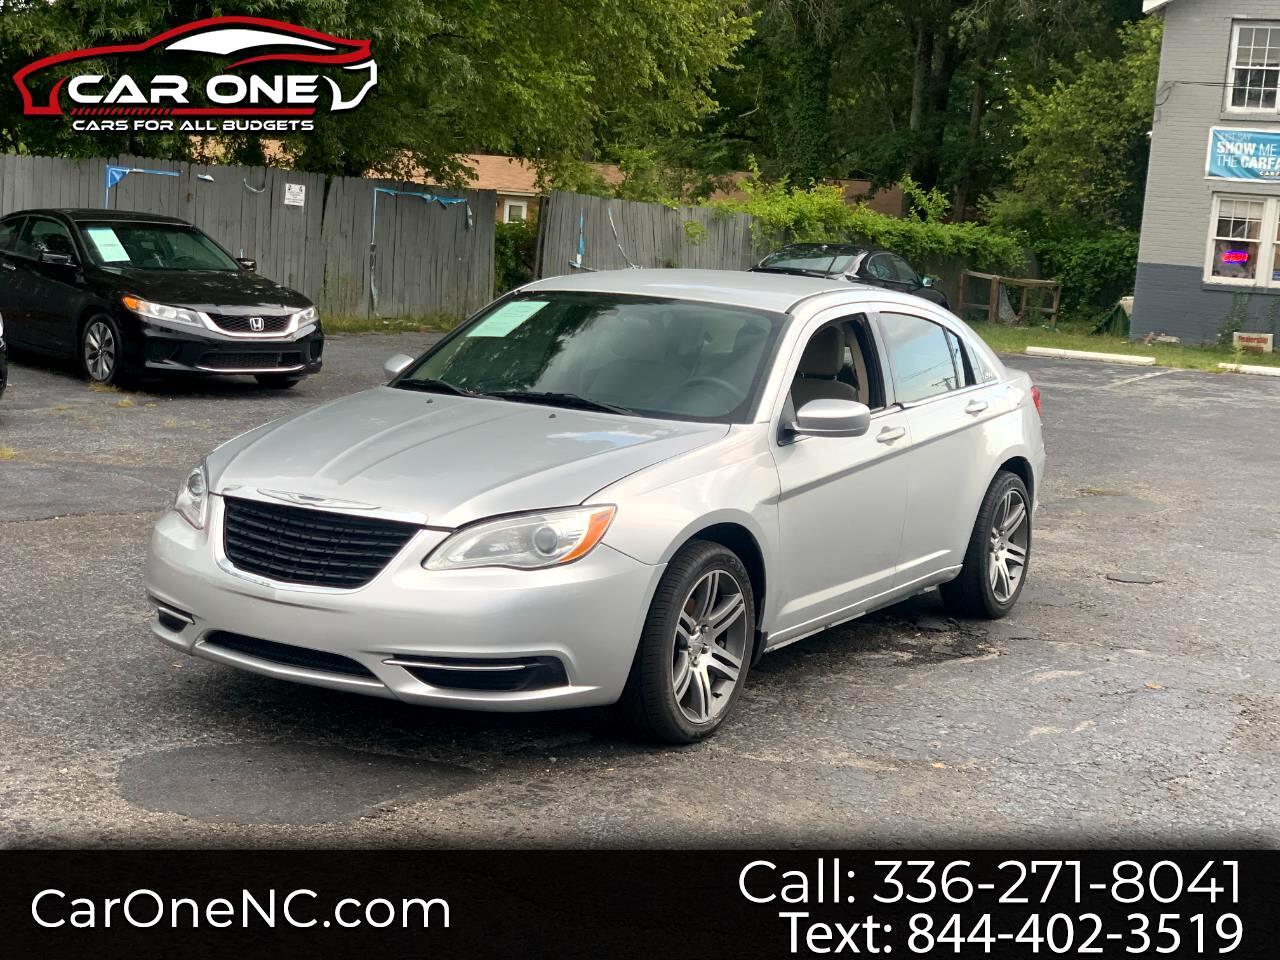 Chrysler 200 4dr Sdn LX 2012